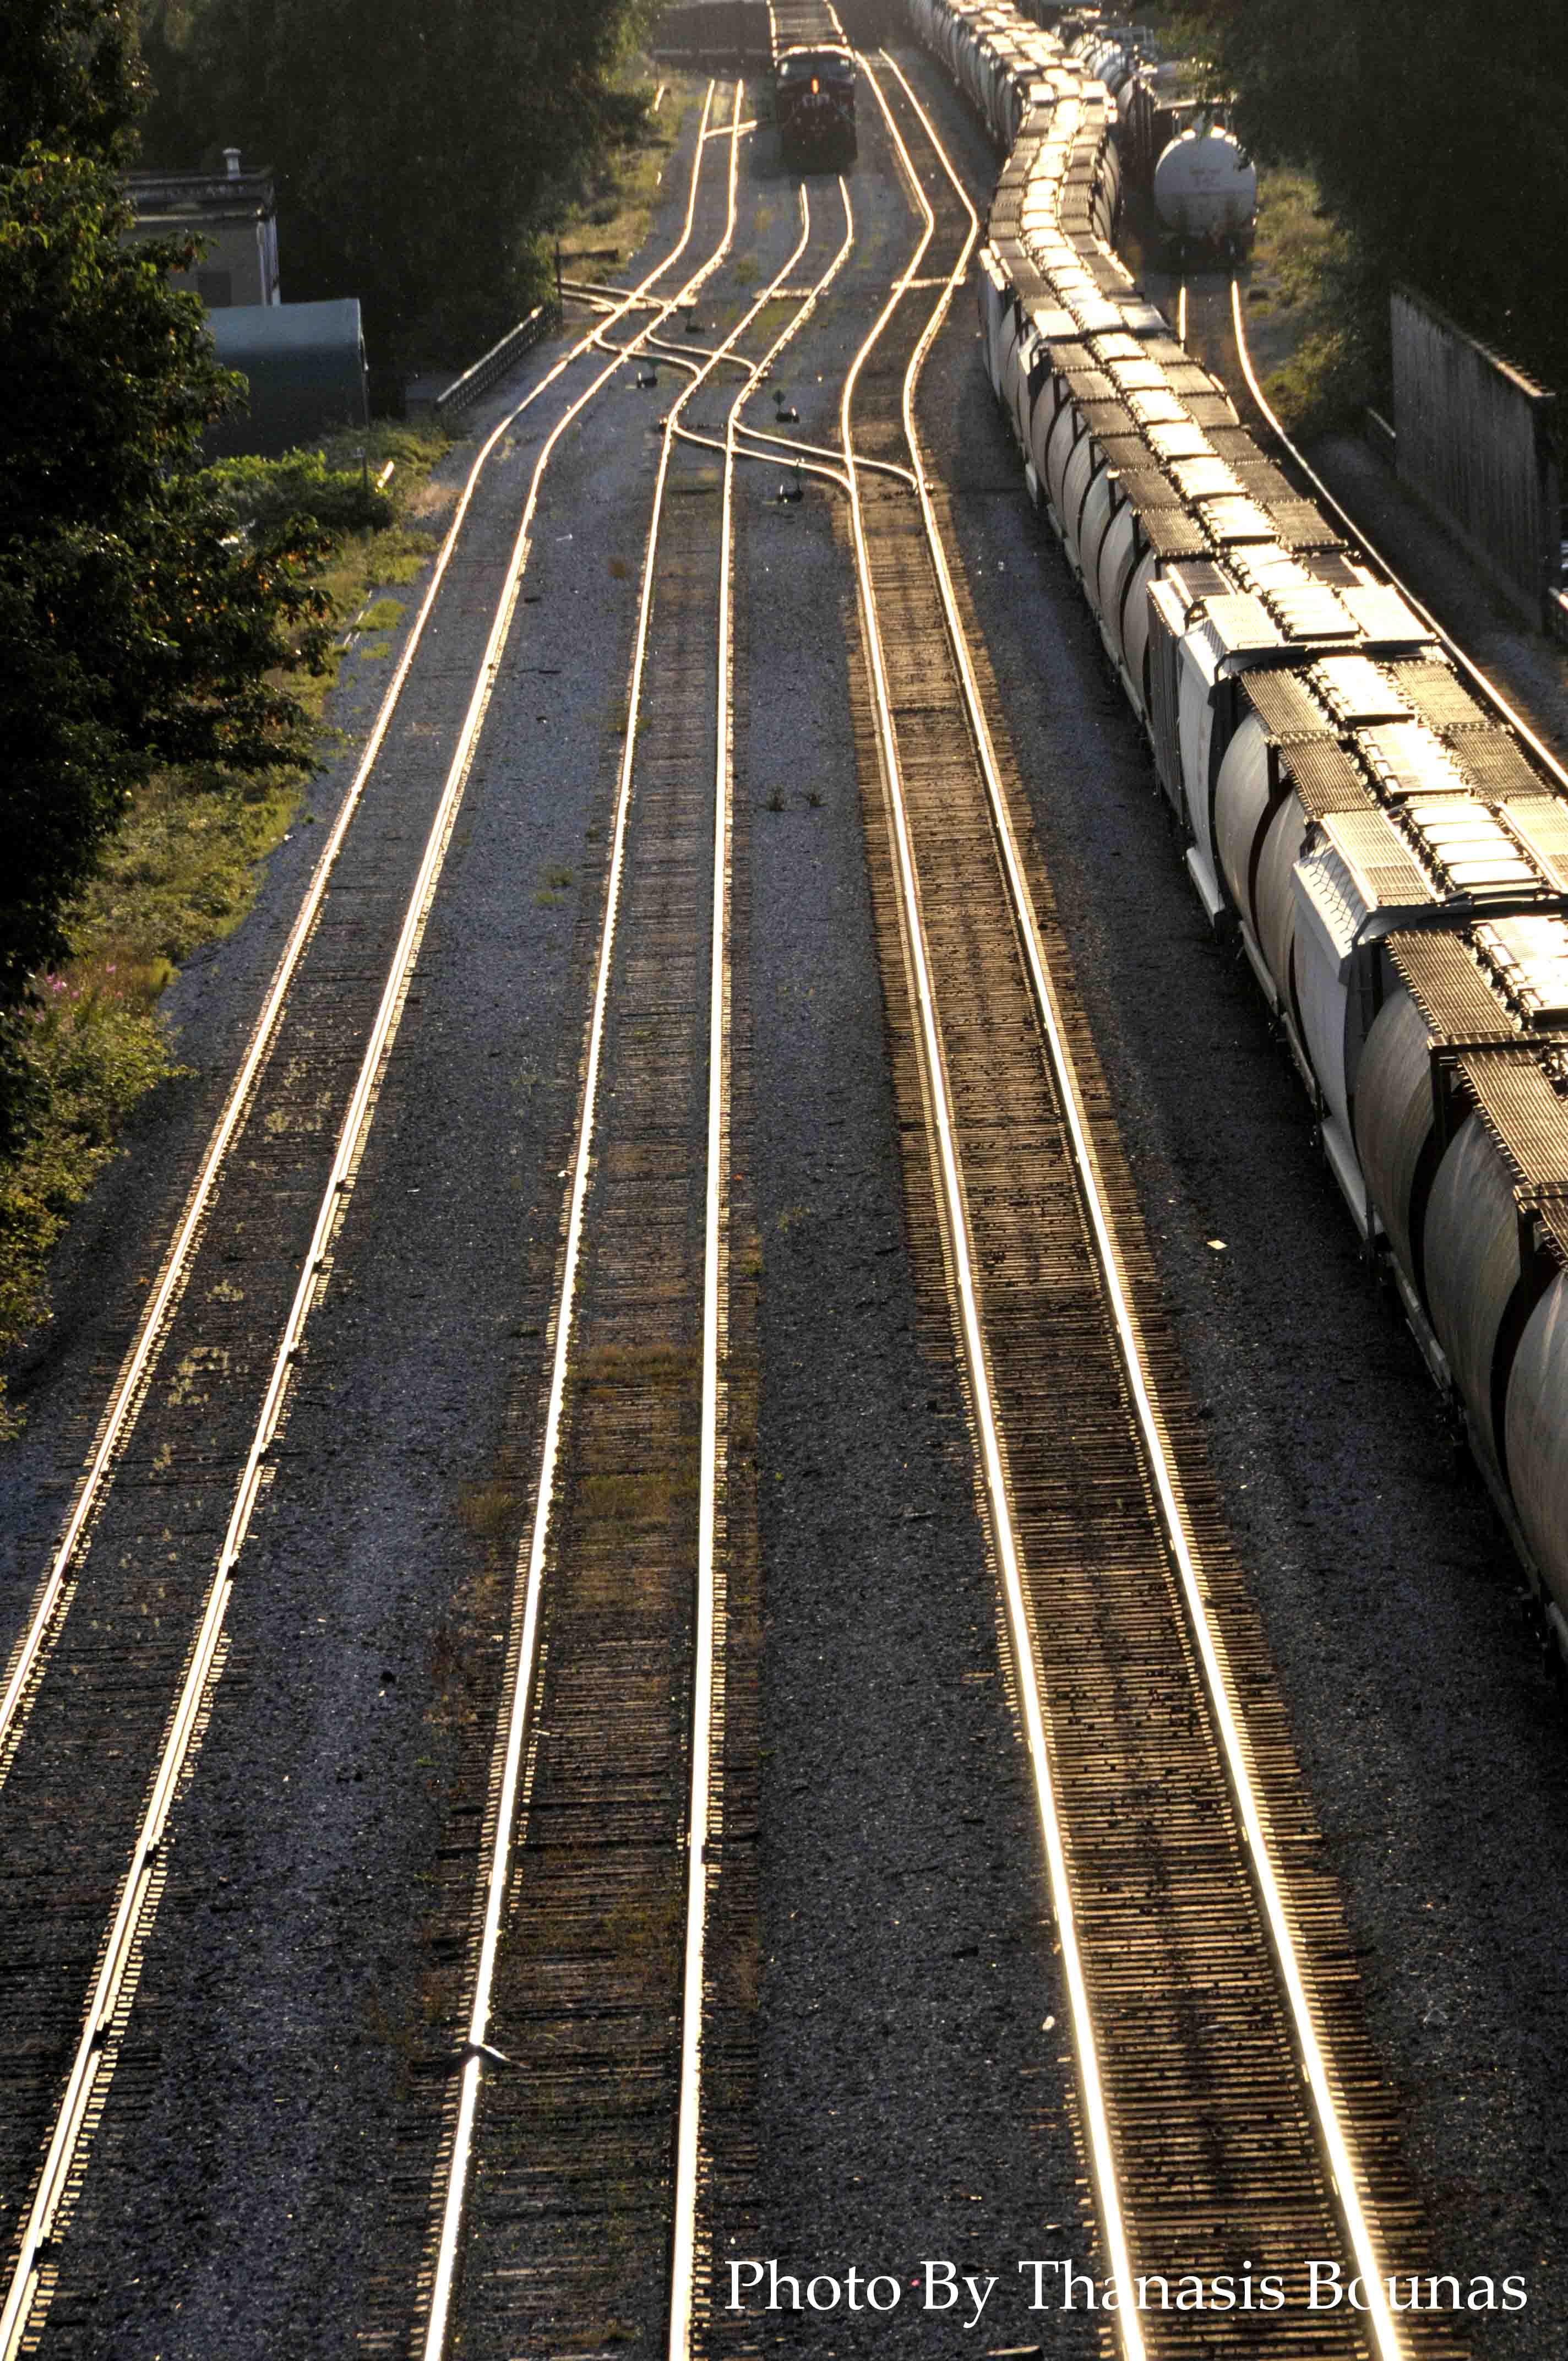 11 Trains Beautiful British Columbia Photo By Thanasis Bounas